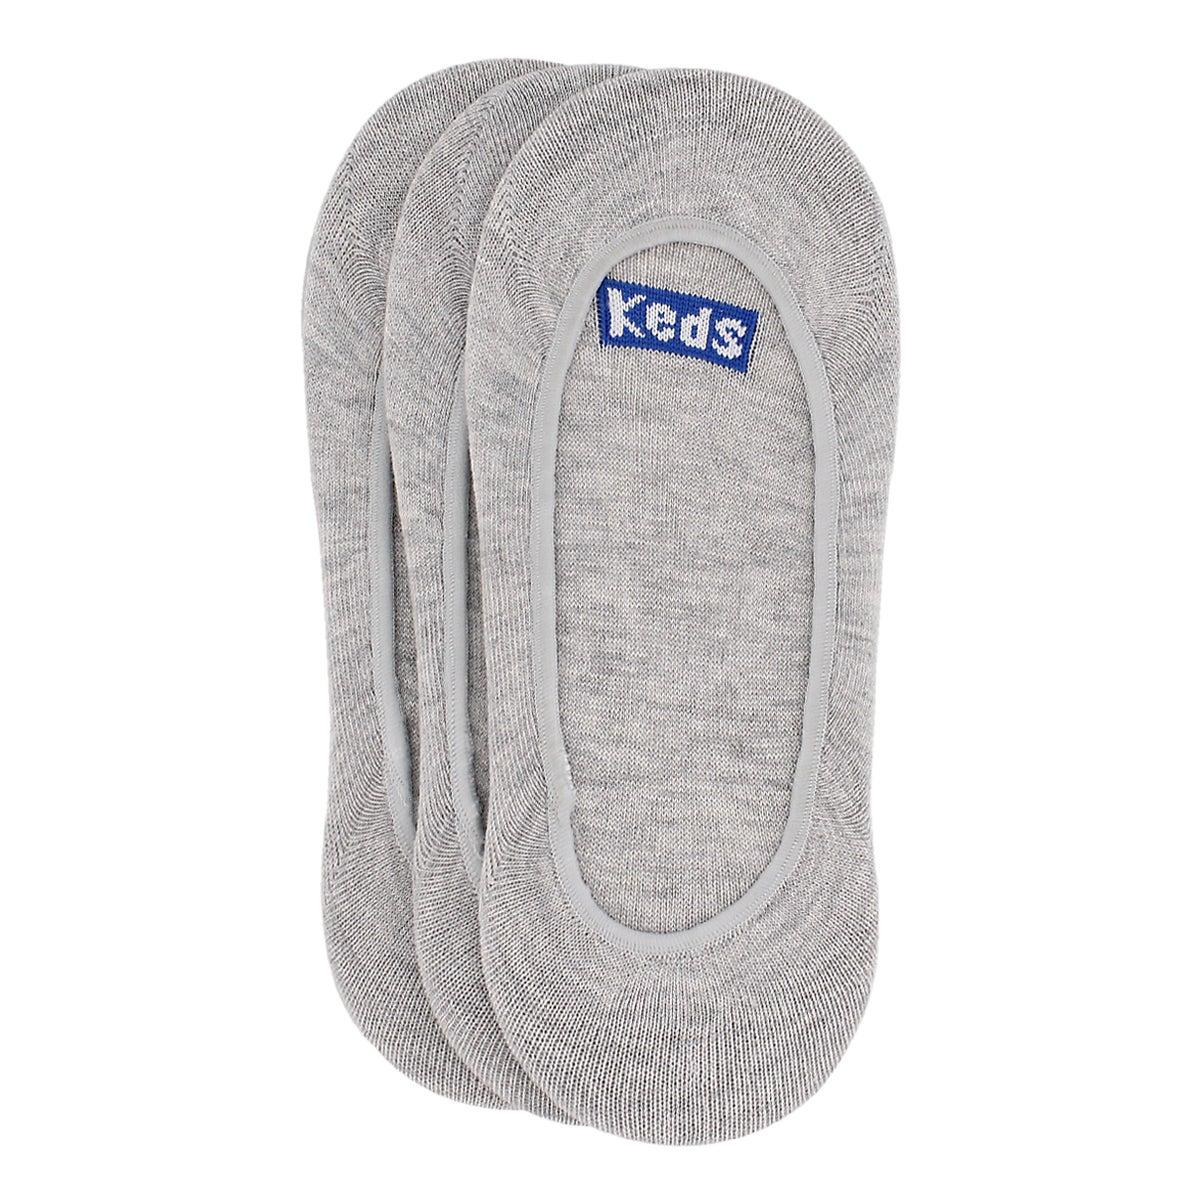 Women's SEASONLESS CORE grey liners - 3pk